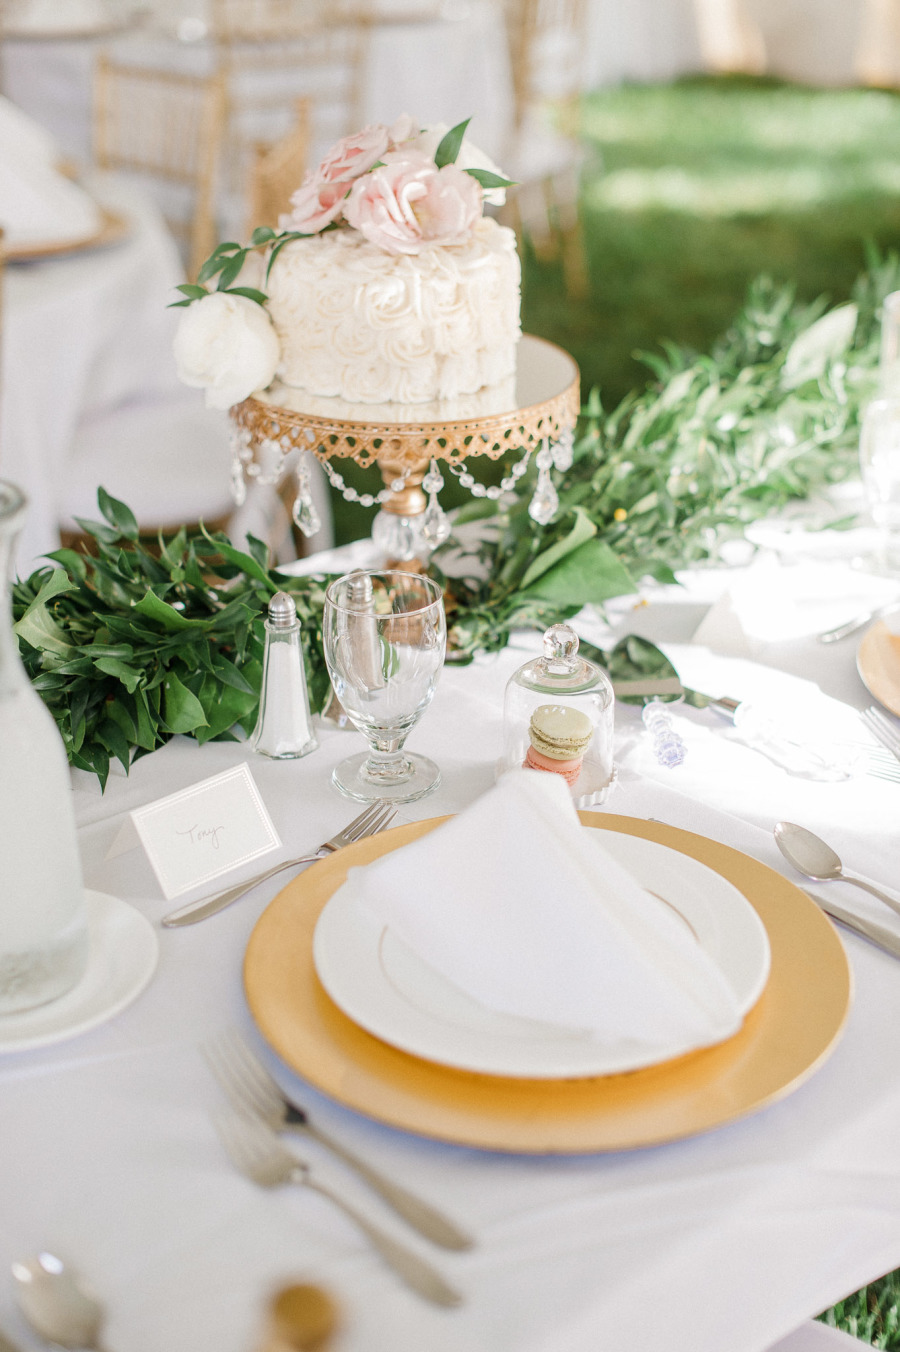 opulent treasures gold chandelier ball base cake stand-jeff sampson photo.jpg